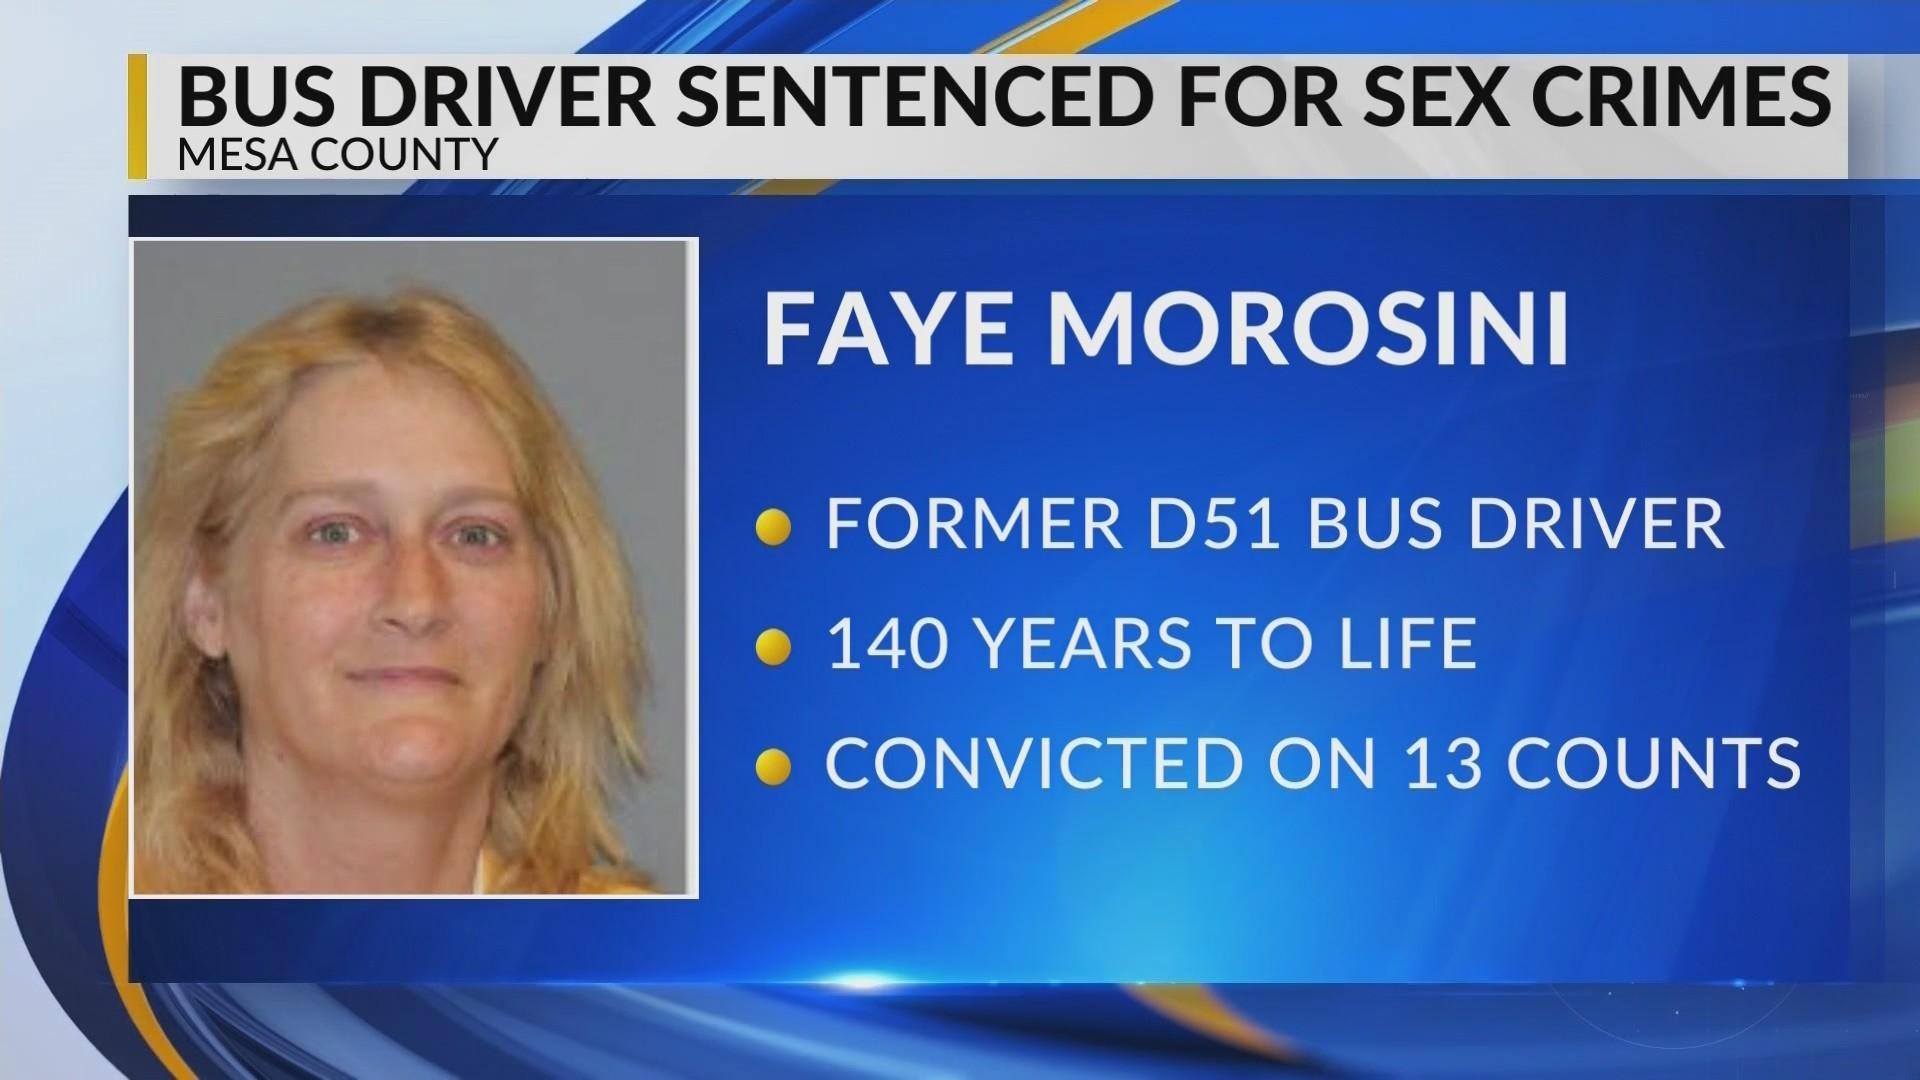 BUS DRIVER SENTENCED